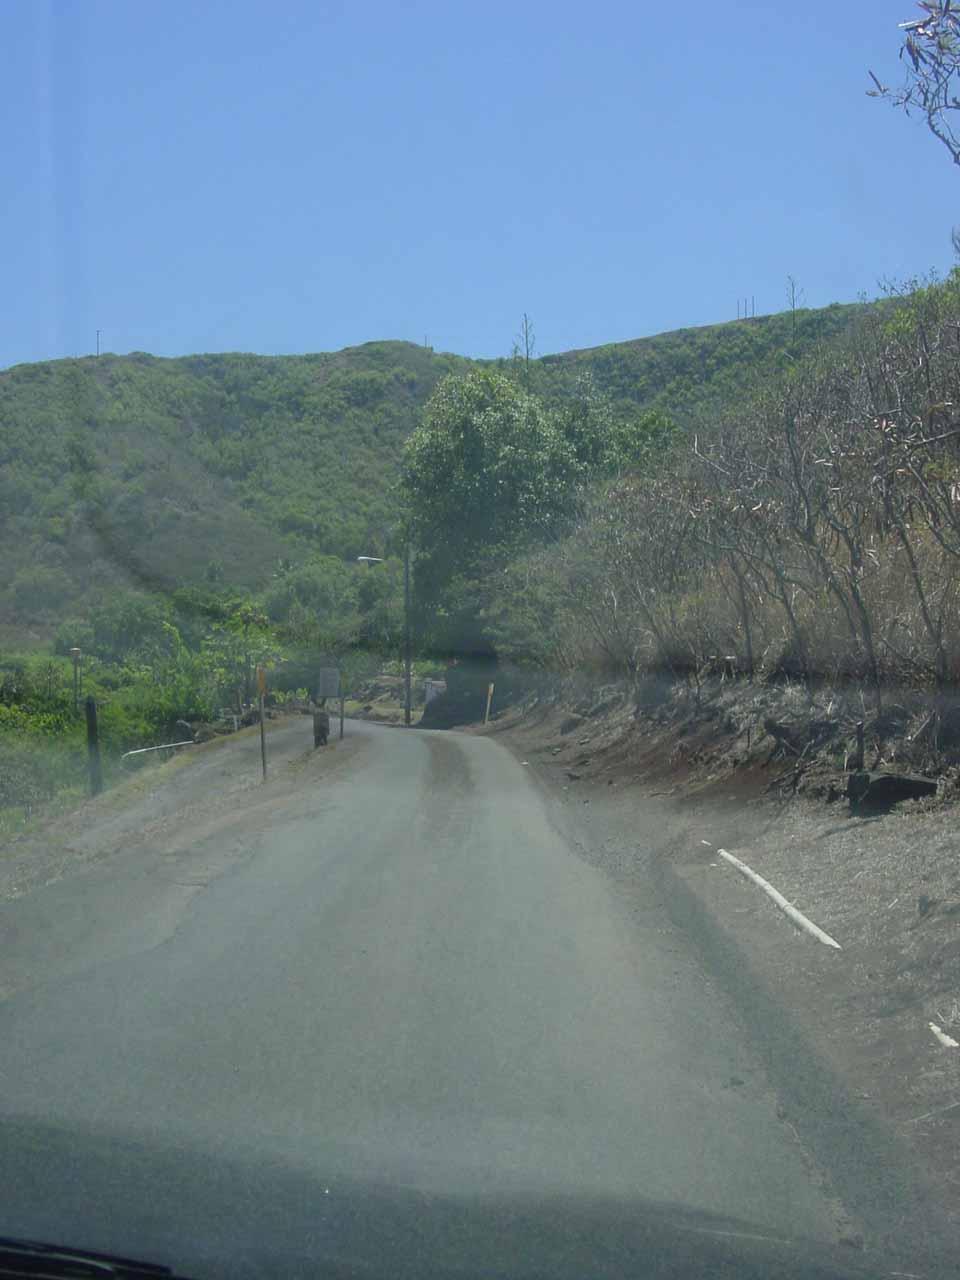 The narrow single-lane road near Kahekili in West Maui